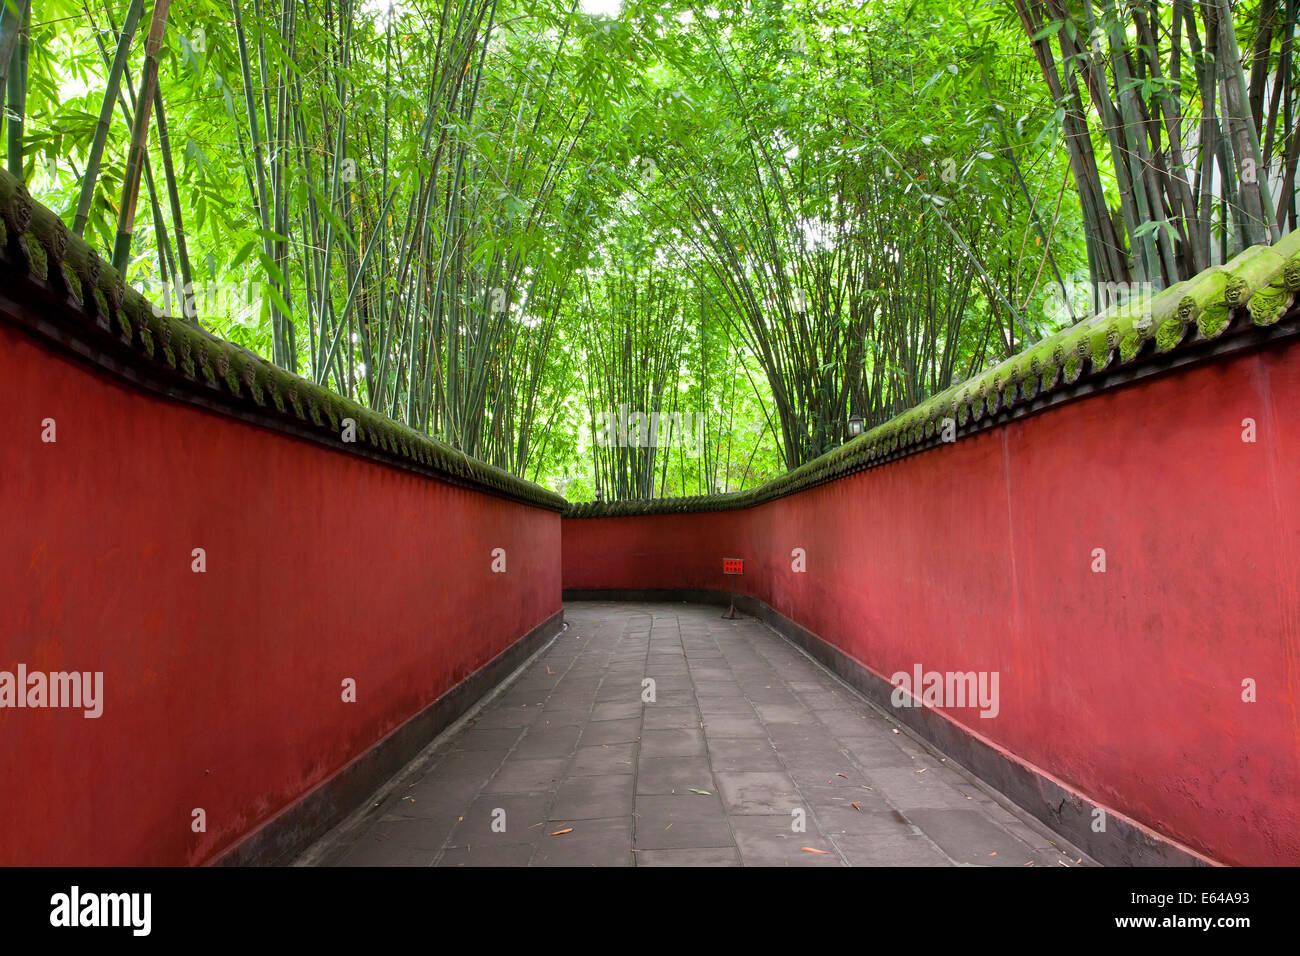 Walkway with bamboo canopy, Wuhou Shrine, Chengdu, Sichuan, China Stock Photo